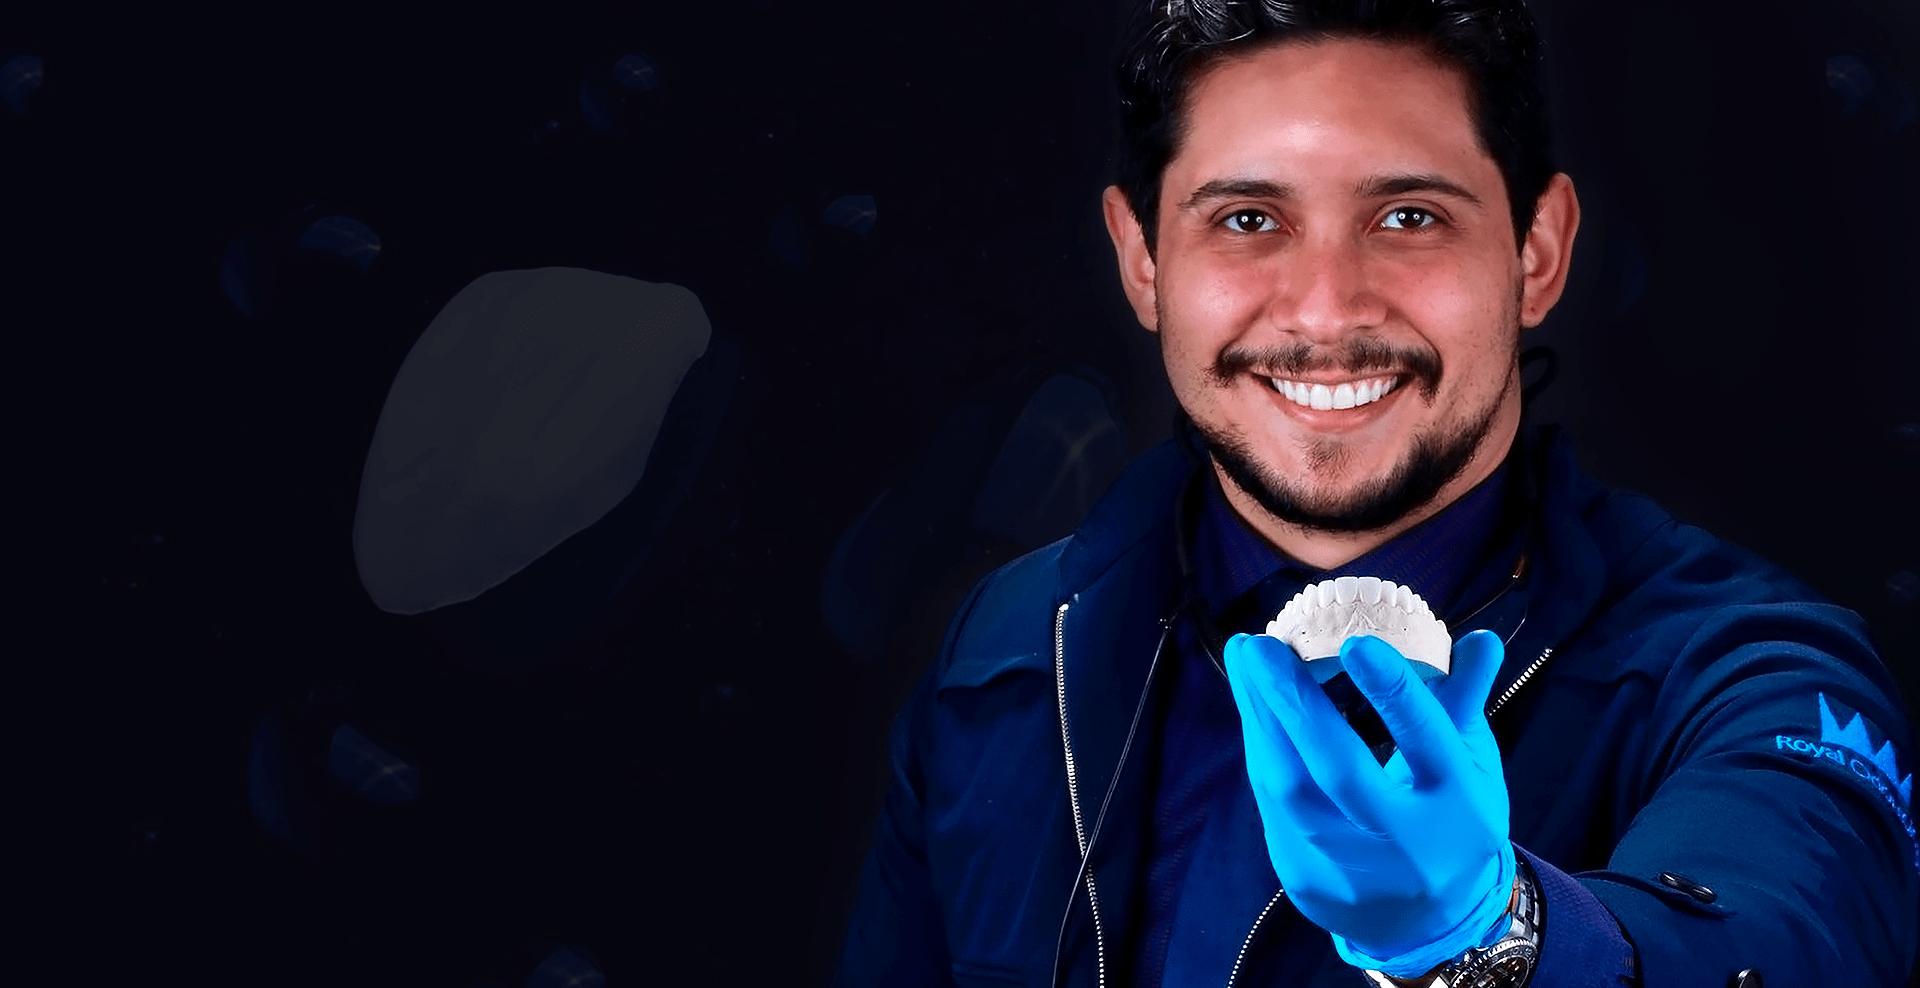 Dr. Guilherme Rocha